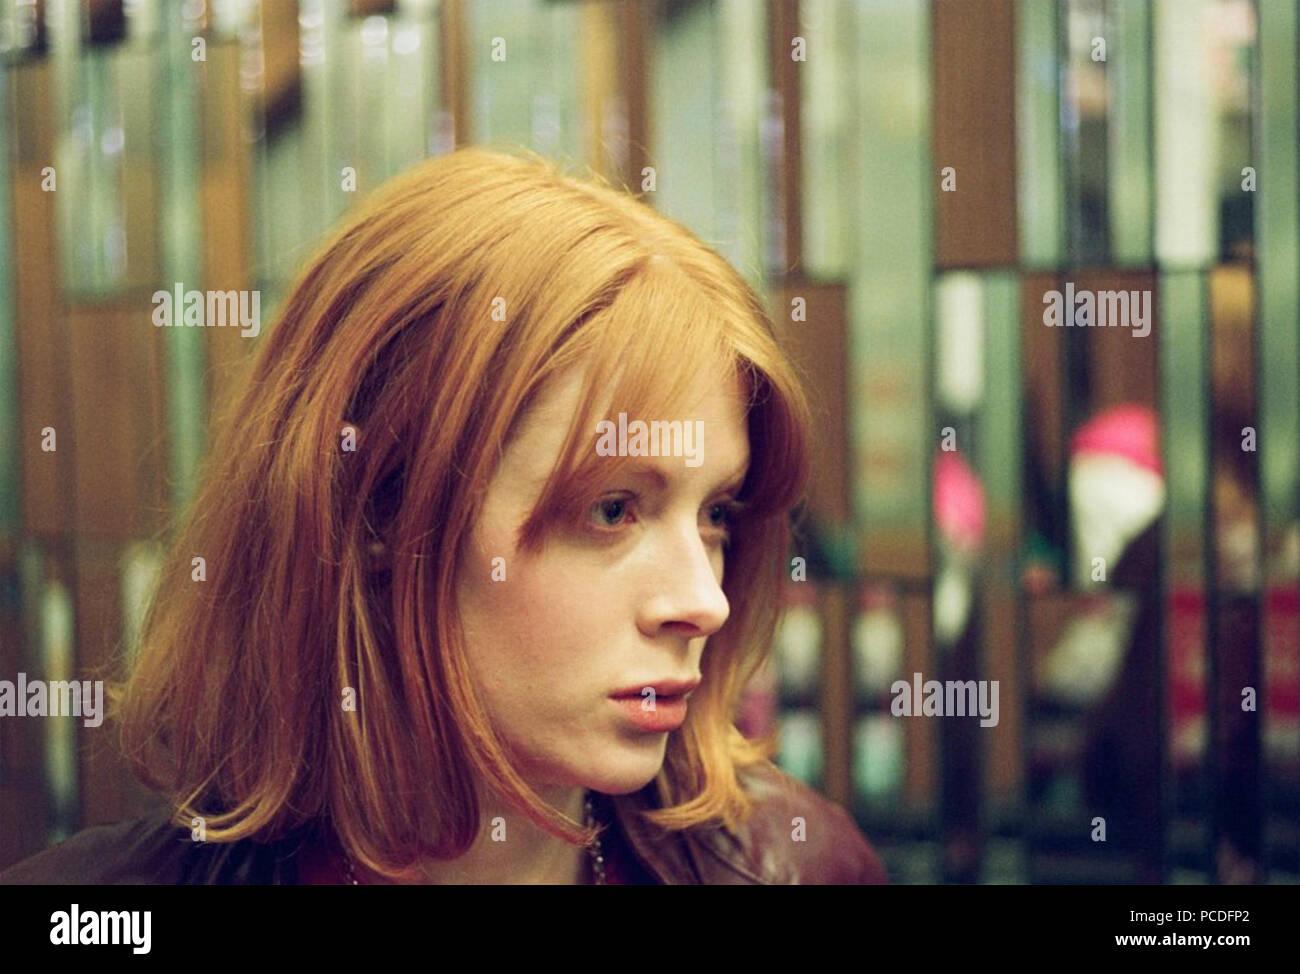 DAPHNE 2017 Das Präsidium Film mit Emily Beecham Stockbild